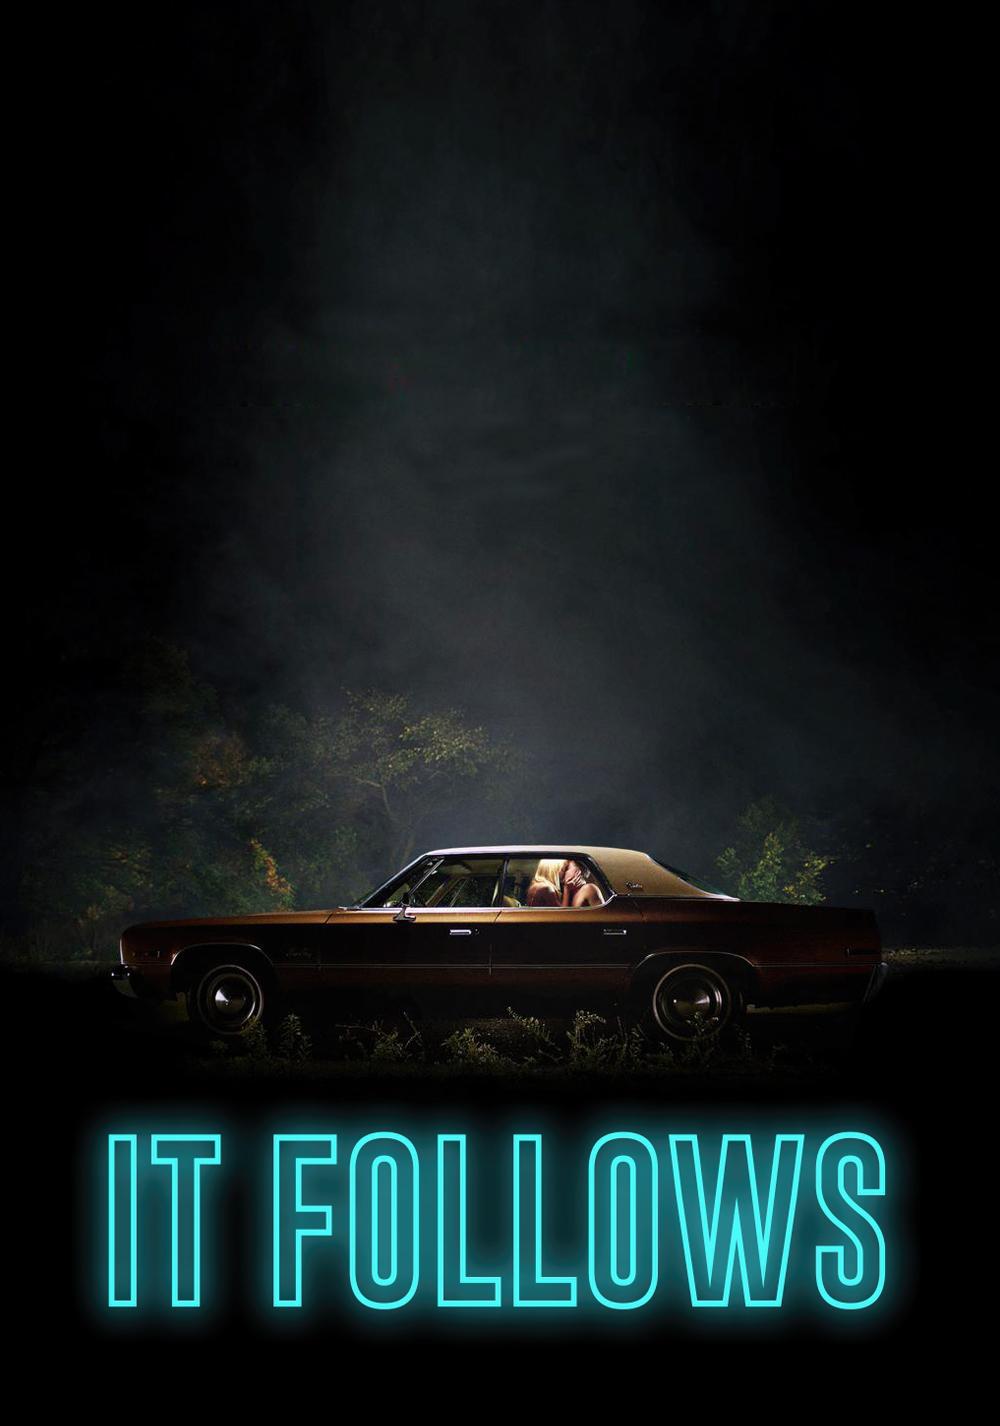 it-follows-movie-poster.